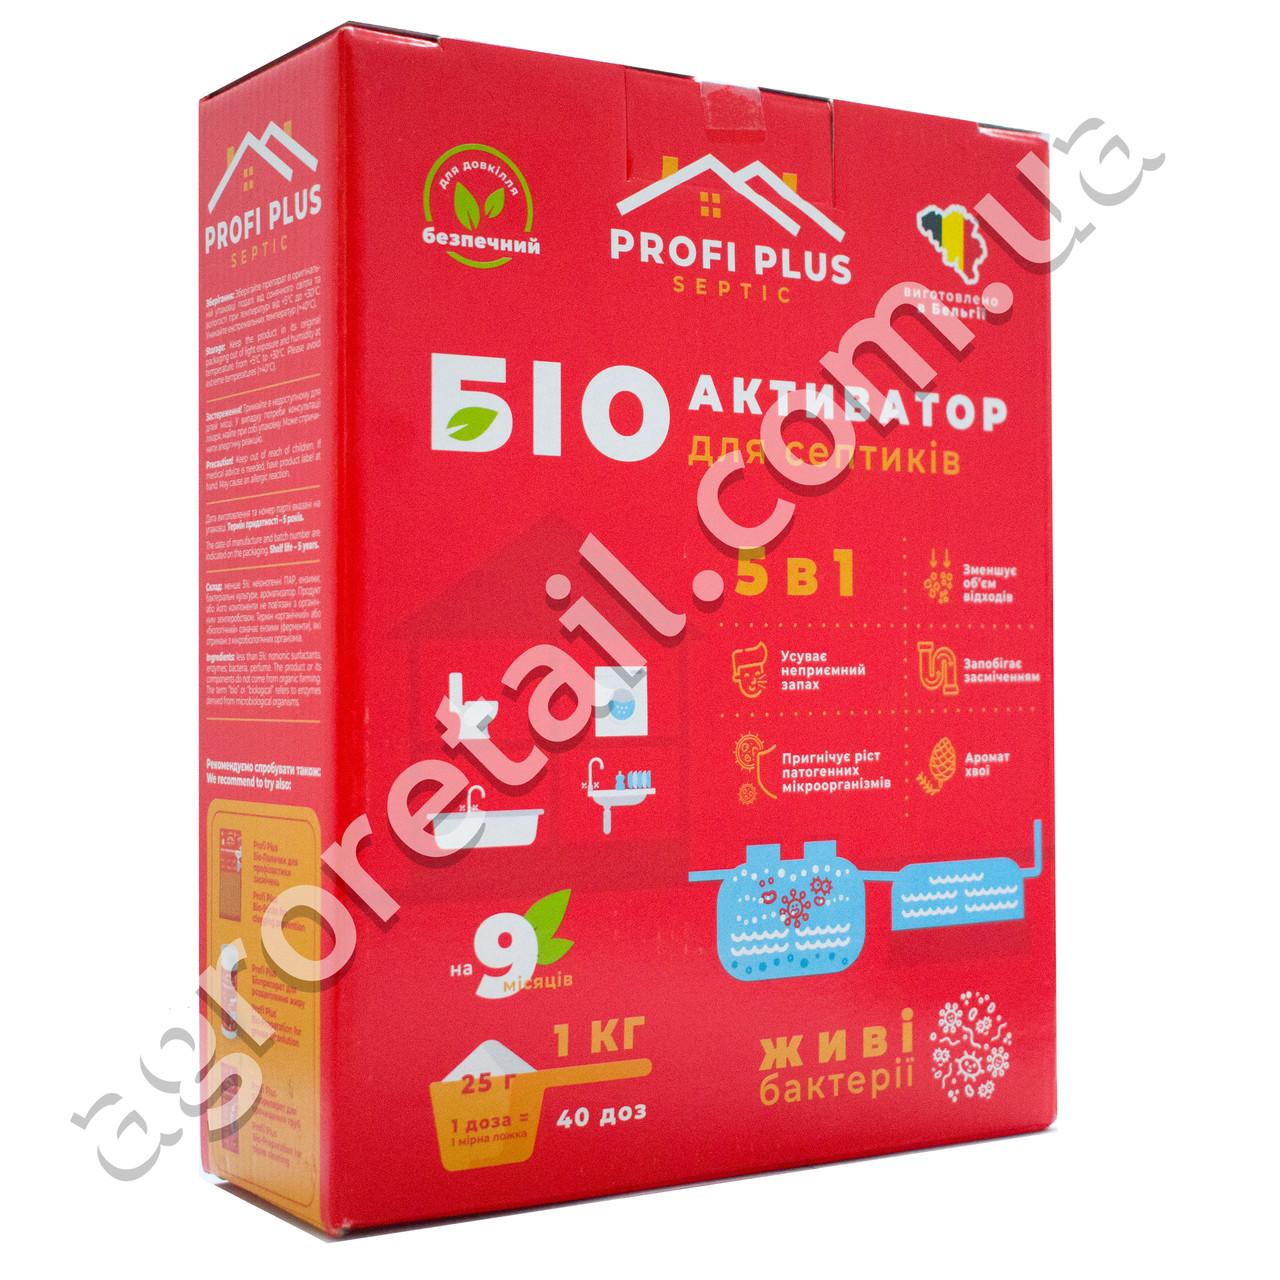 Биоактиватор для септиков Профи плюс 1 кг